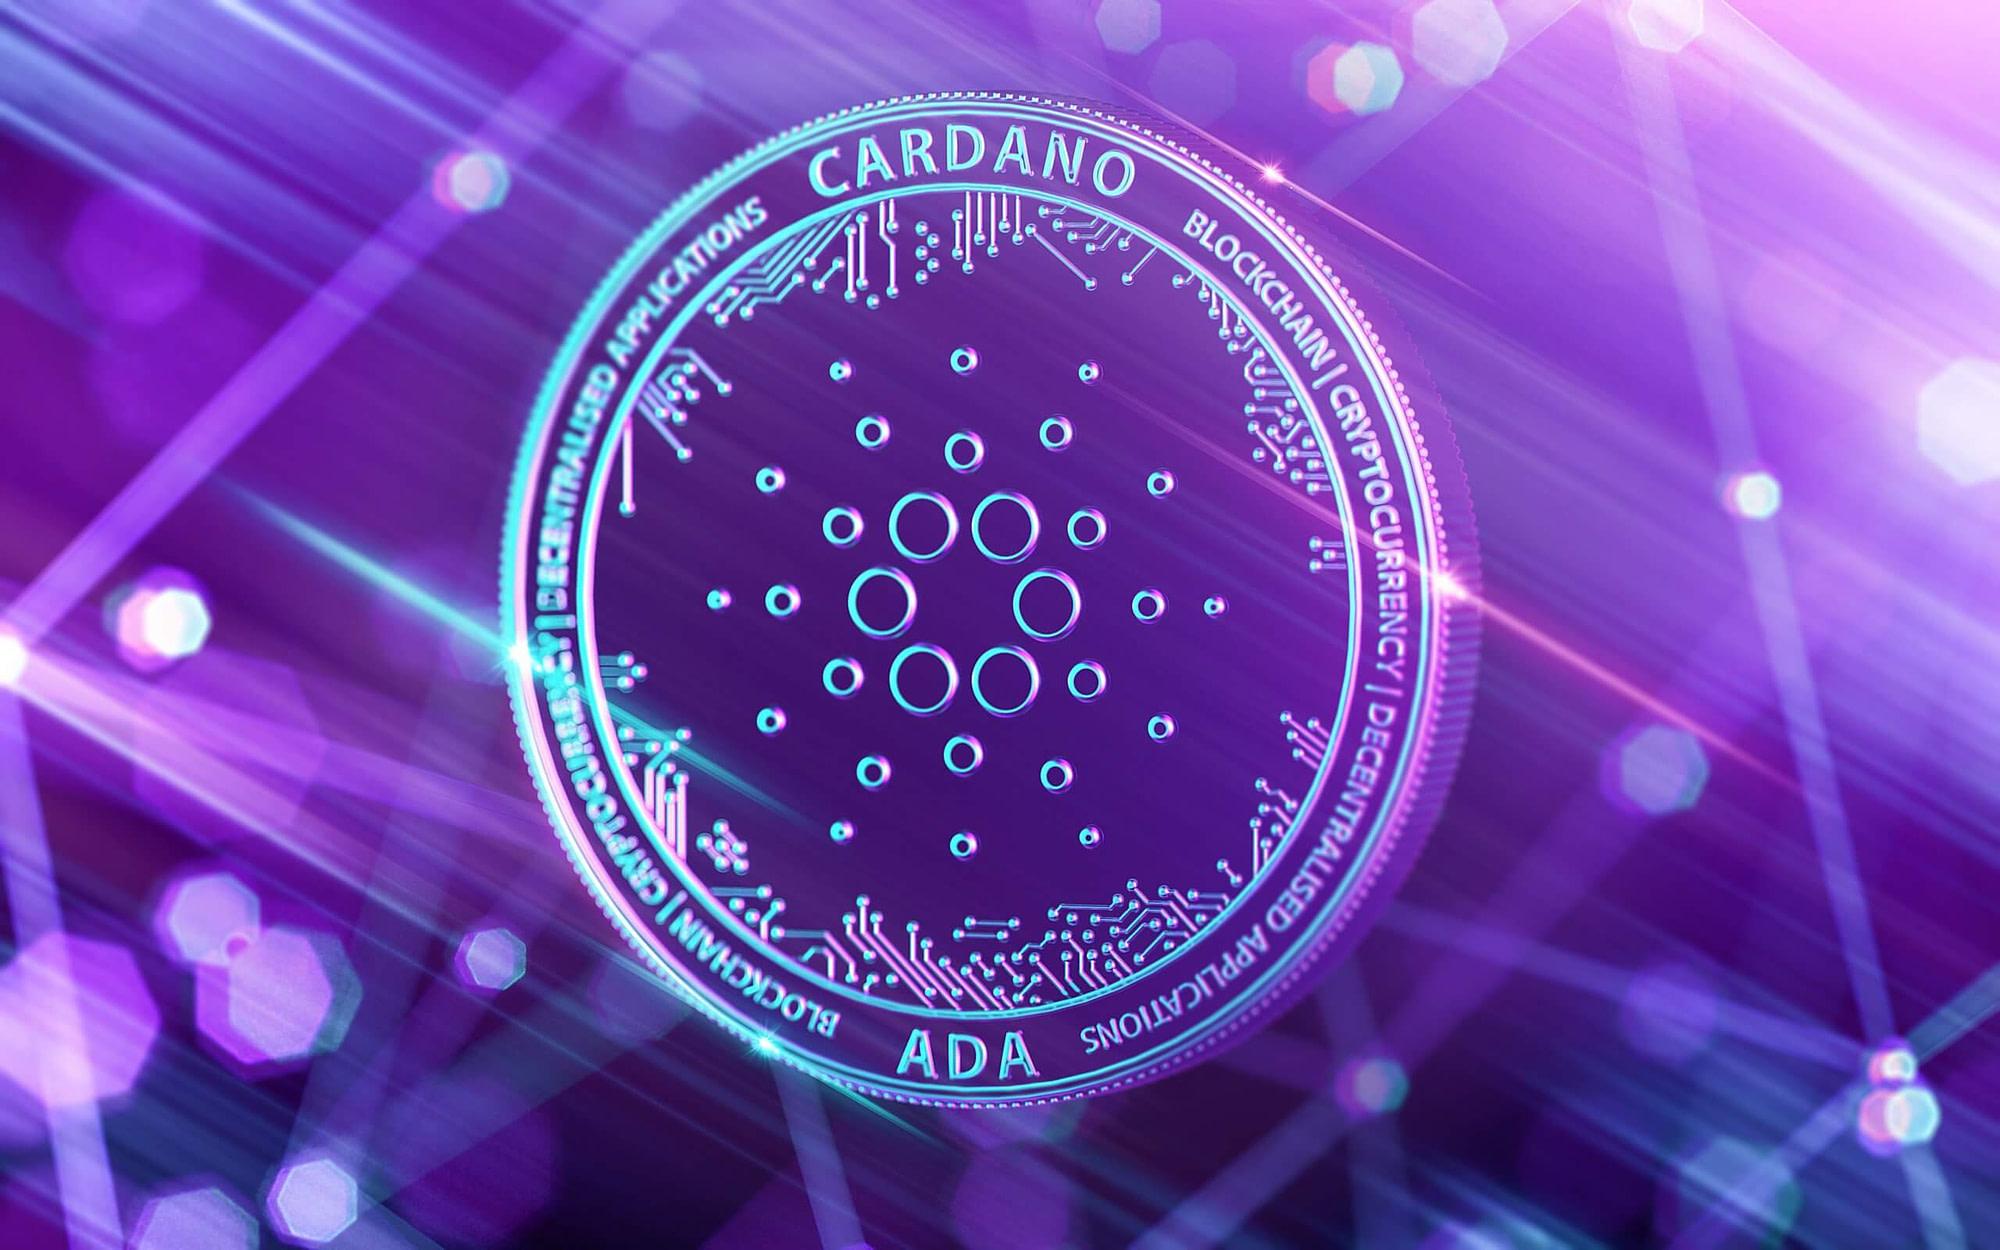 Прием оплаты Cardano ADA! Квест-проект «FoX»